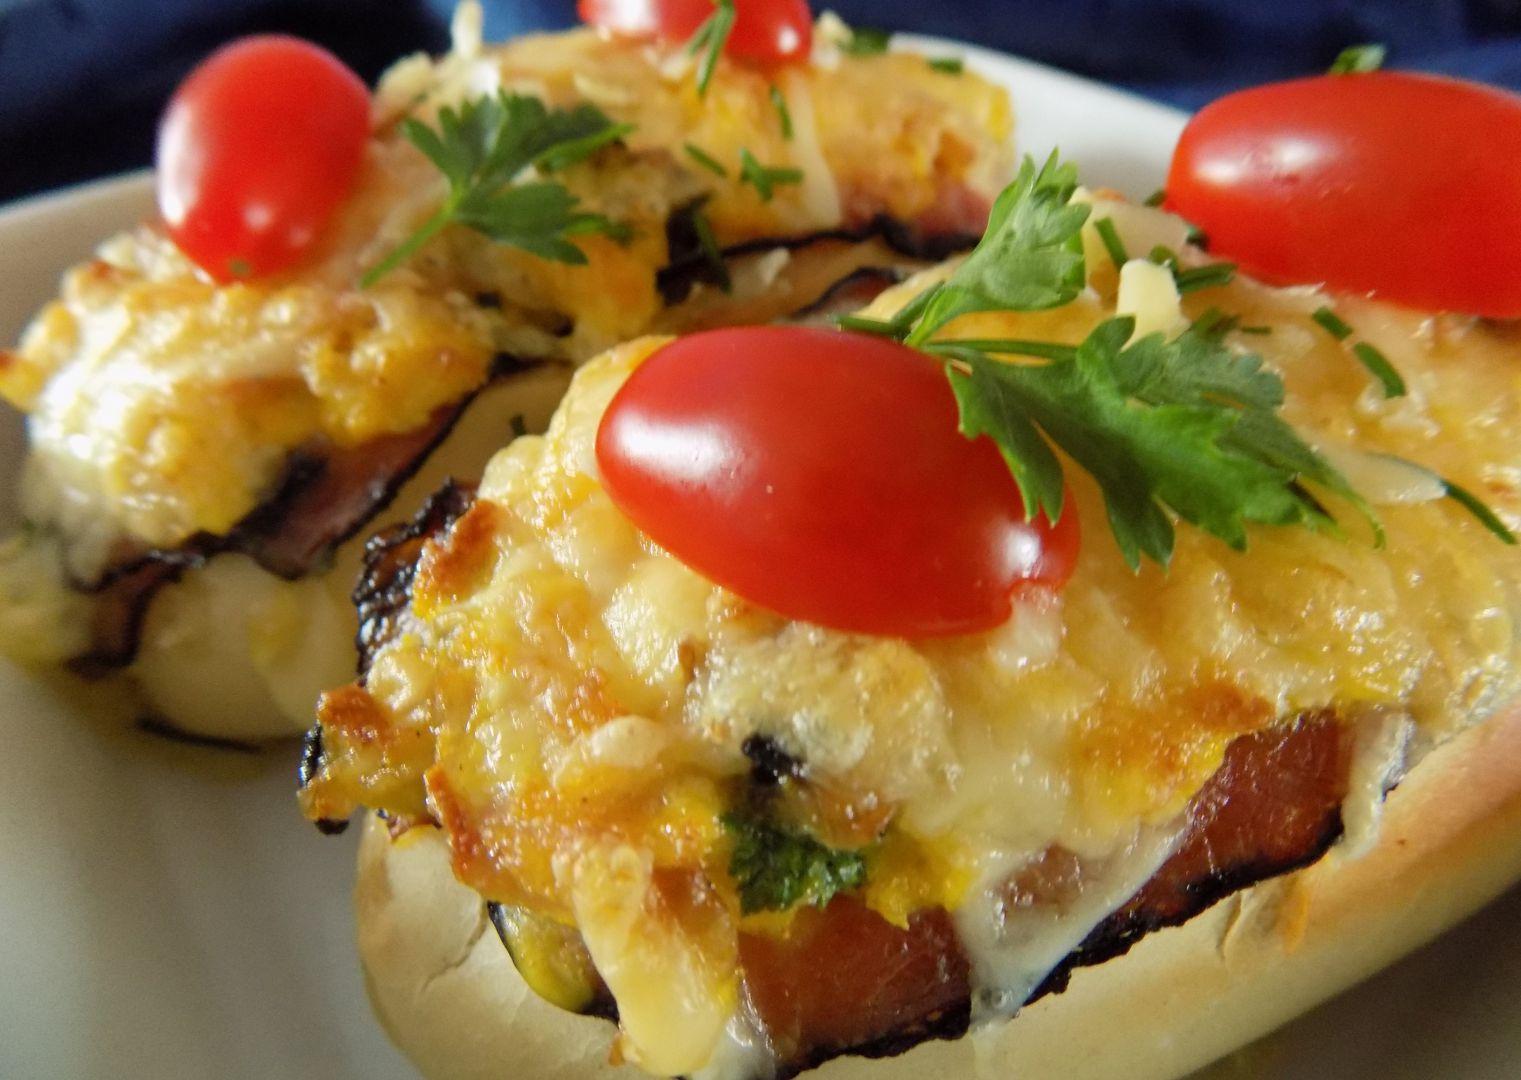 Zapečená bageta se žampionovými vejci, slaninou a sýrem recept ...